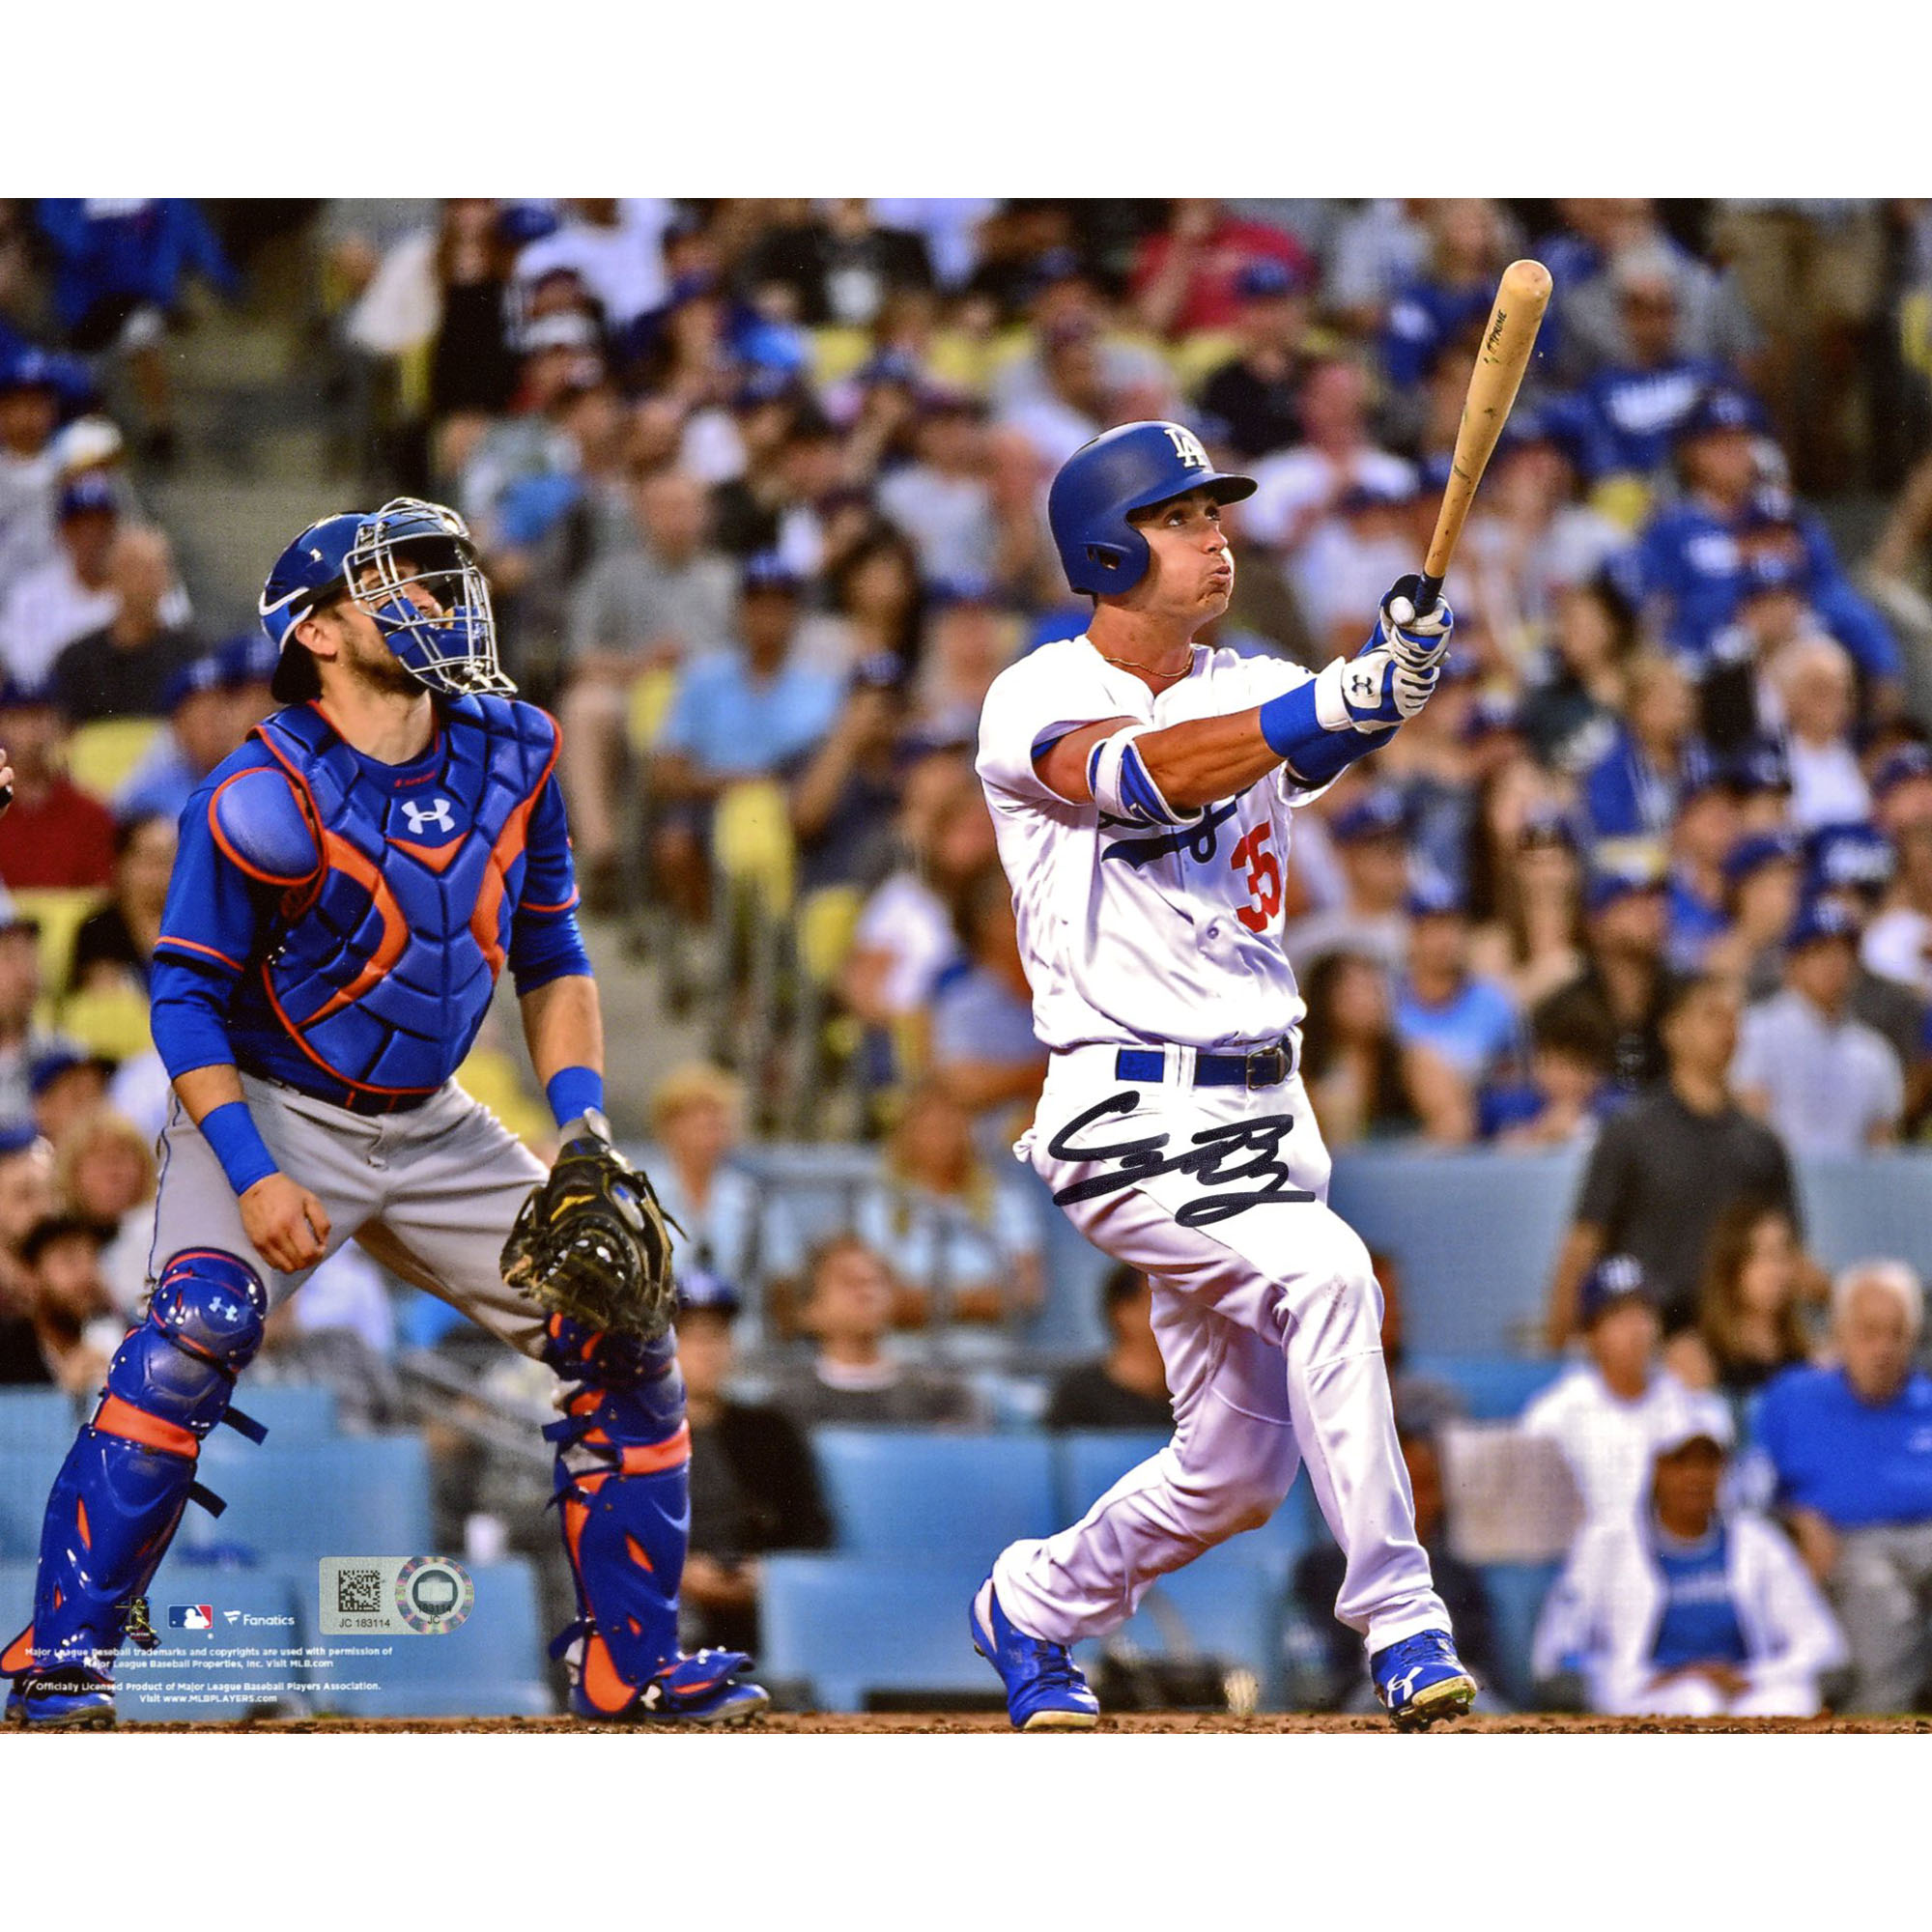 "Cody Bellinger Los Angeles Dodgers Fanatics Authentic Autographed 8"" x 10"" Hitting Home Run Photograph - No Size"